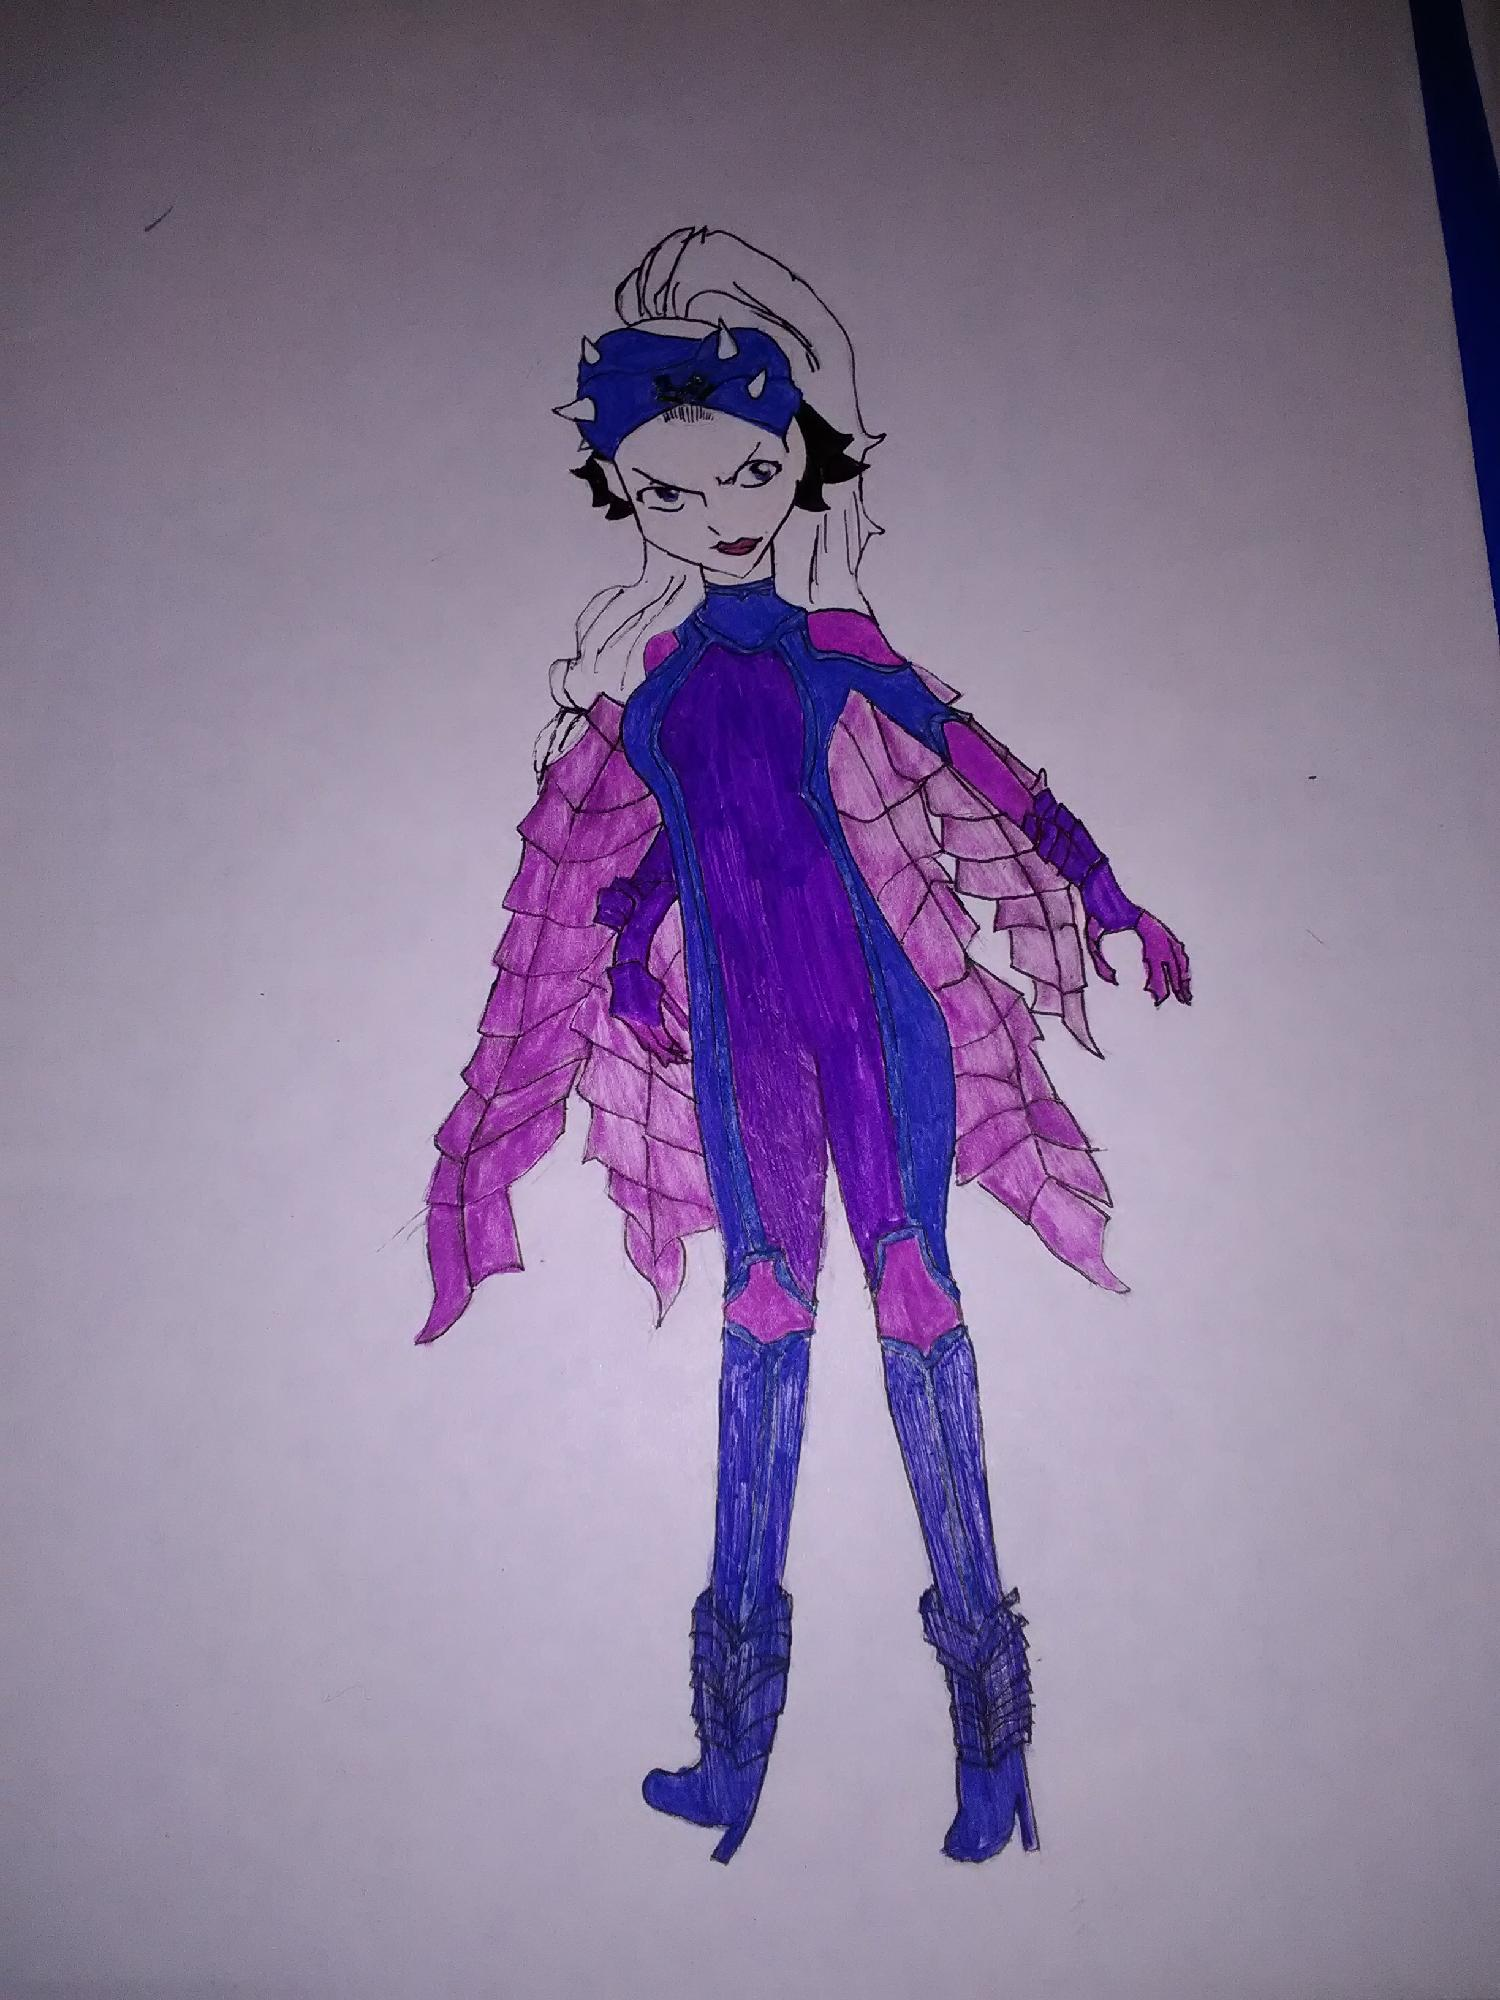 My drawing of Mirajane alegria